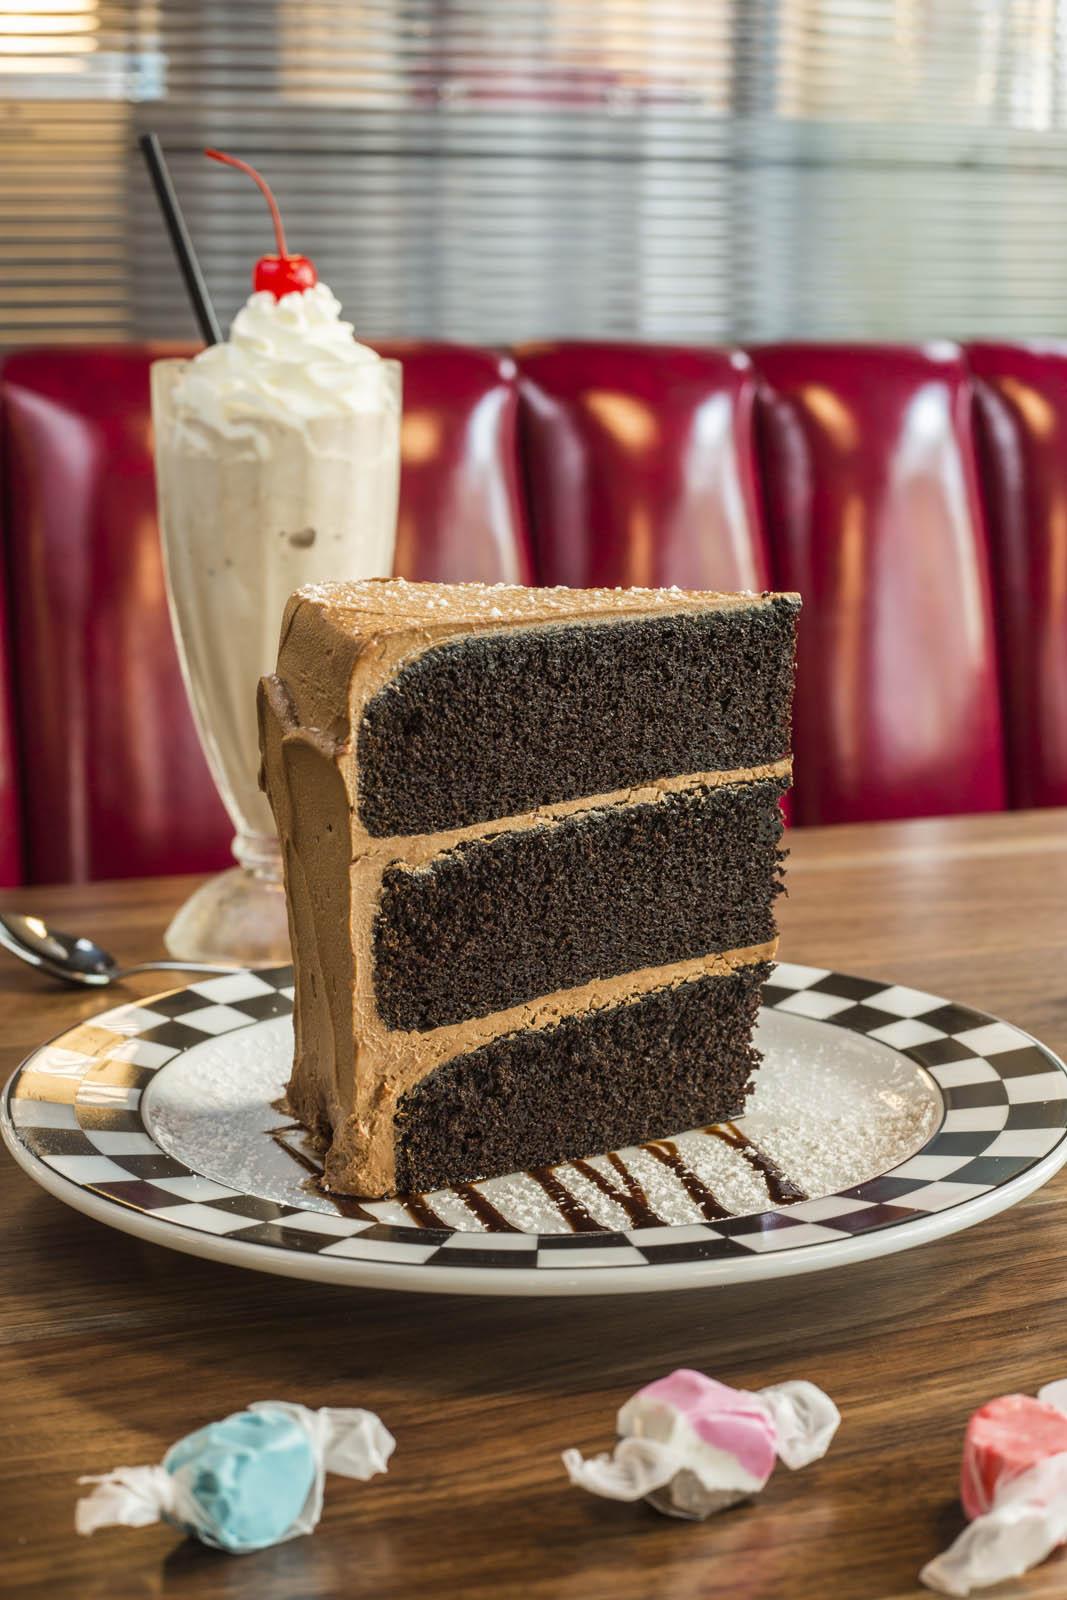 Famous Cap City chocolate cake